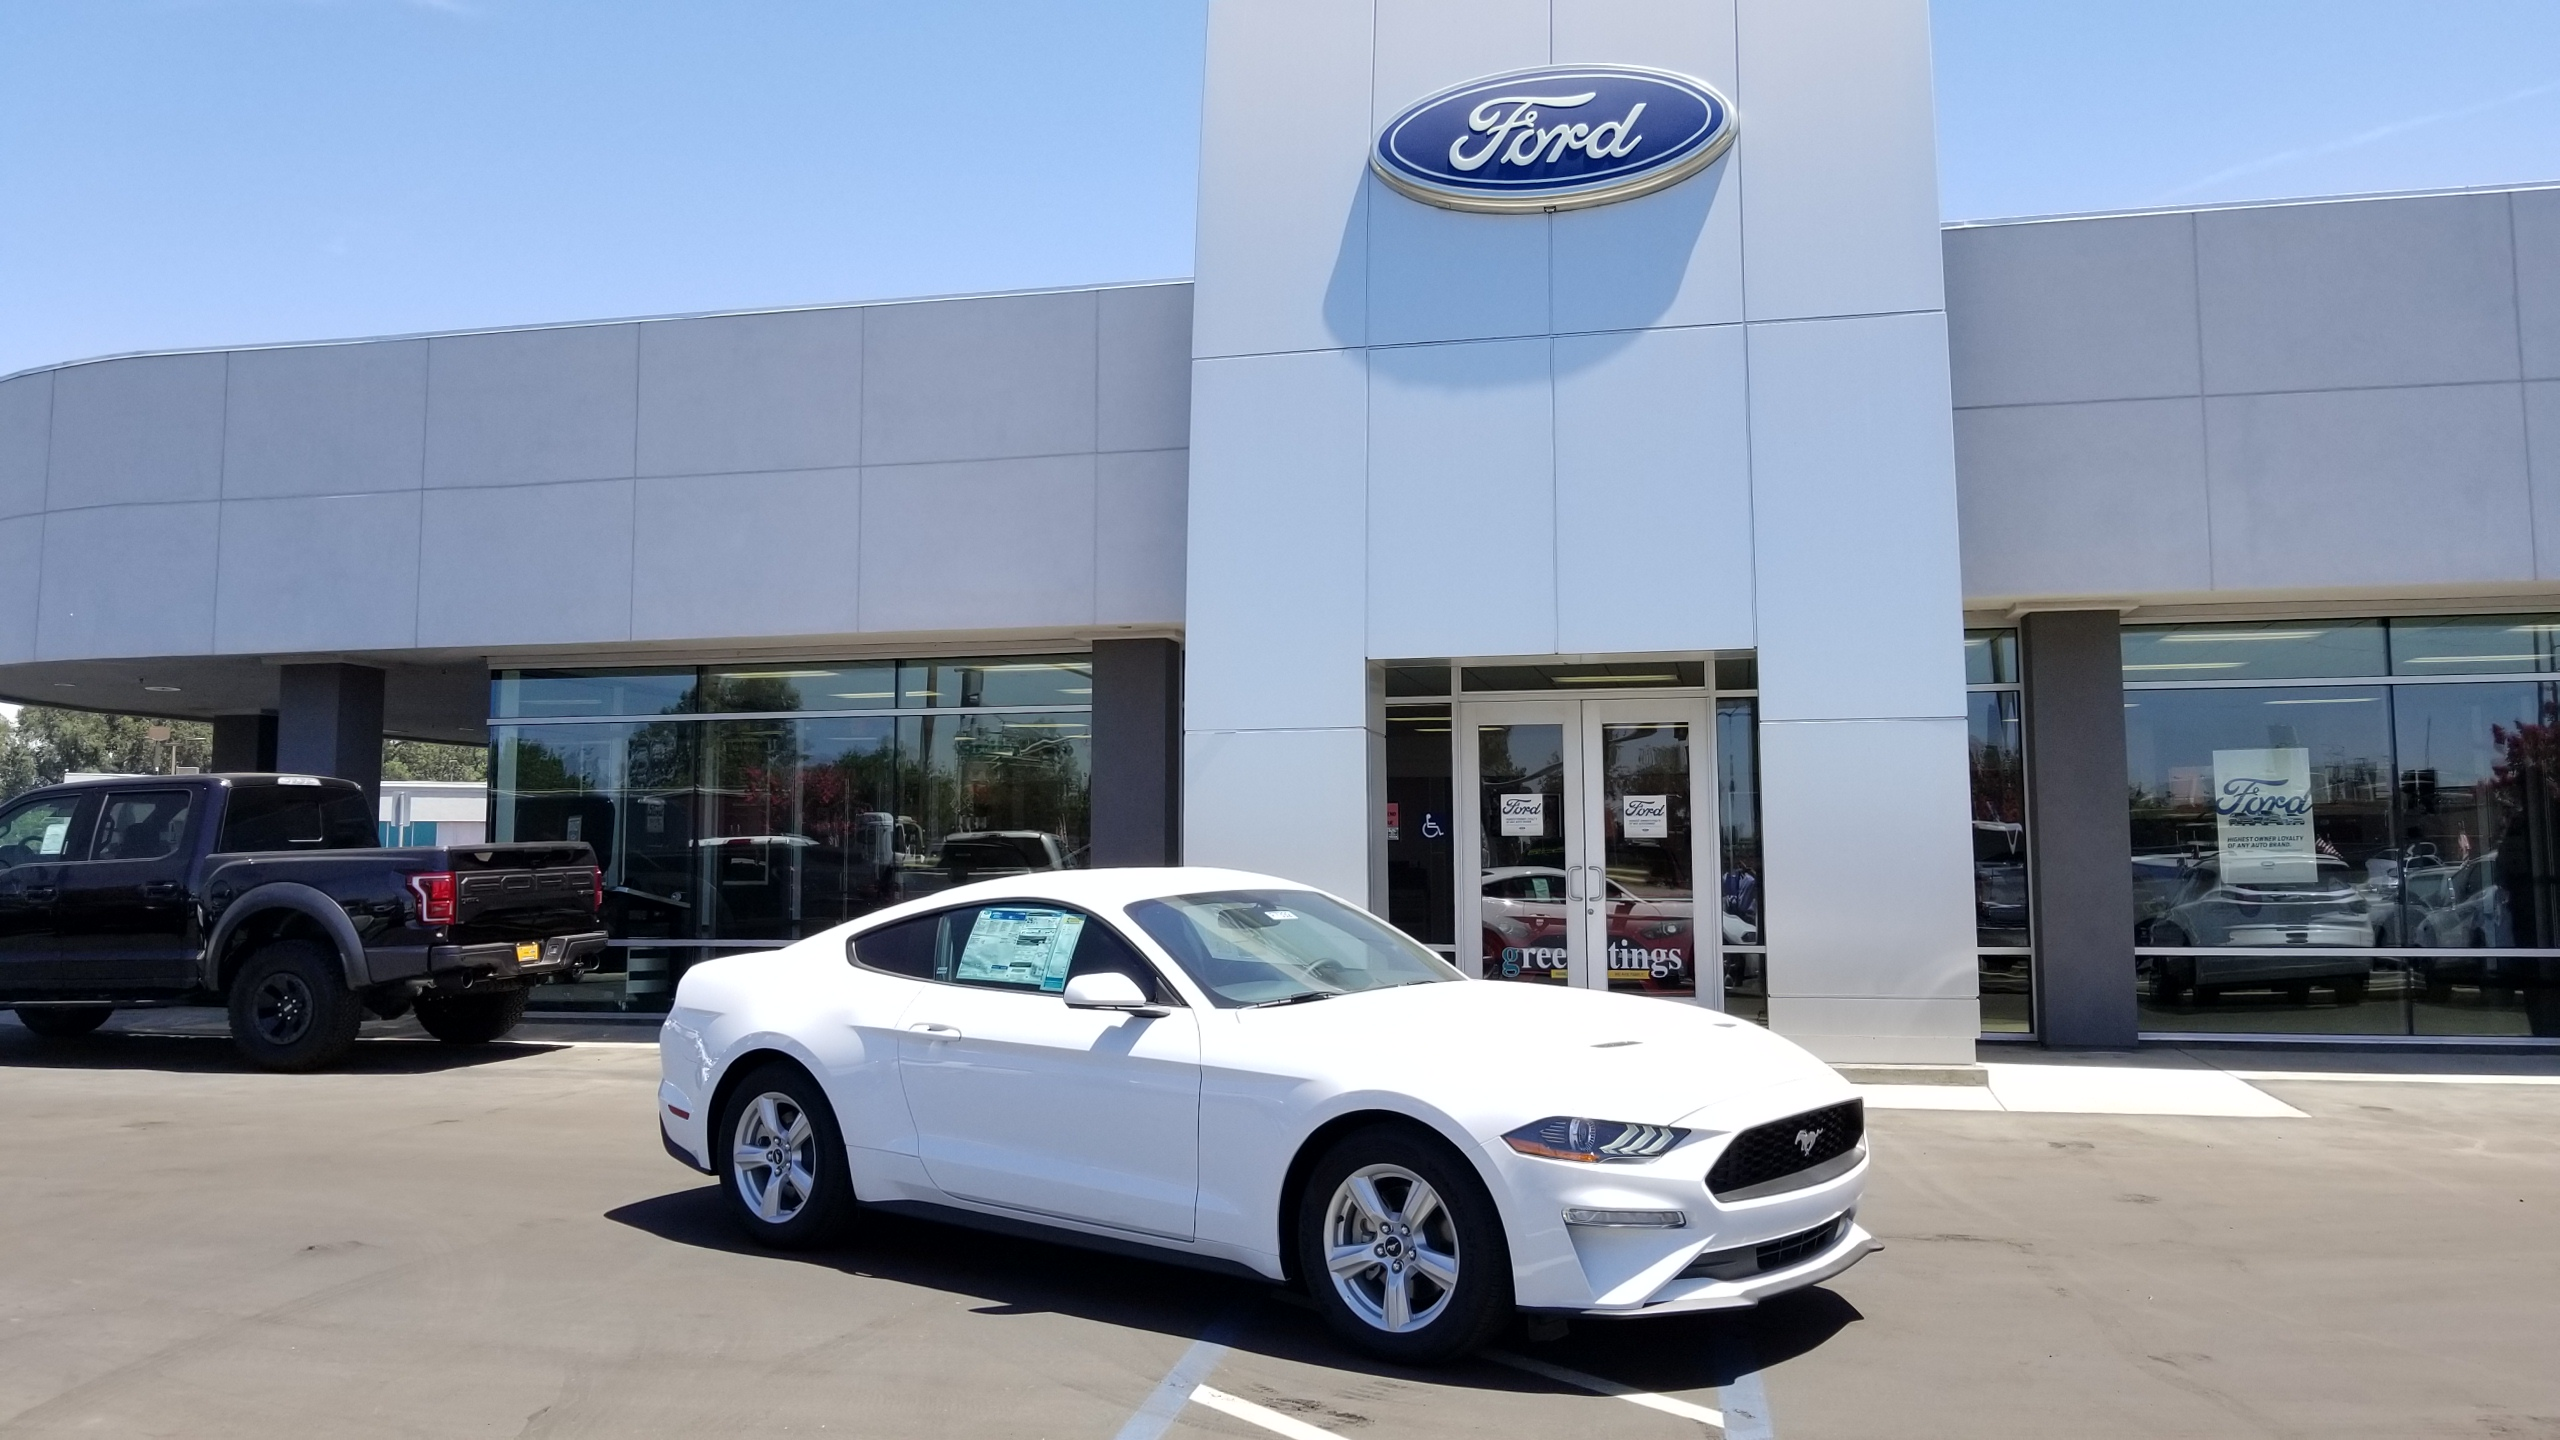 New 2018 Ford Mustang Groppetti Automotive Visalia CA